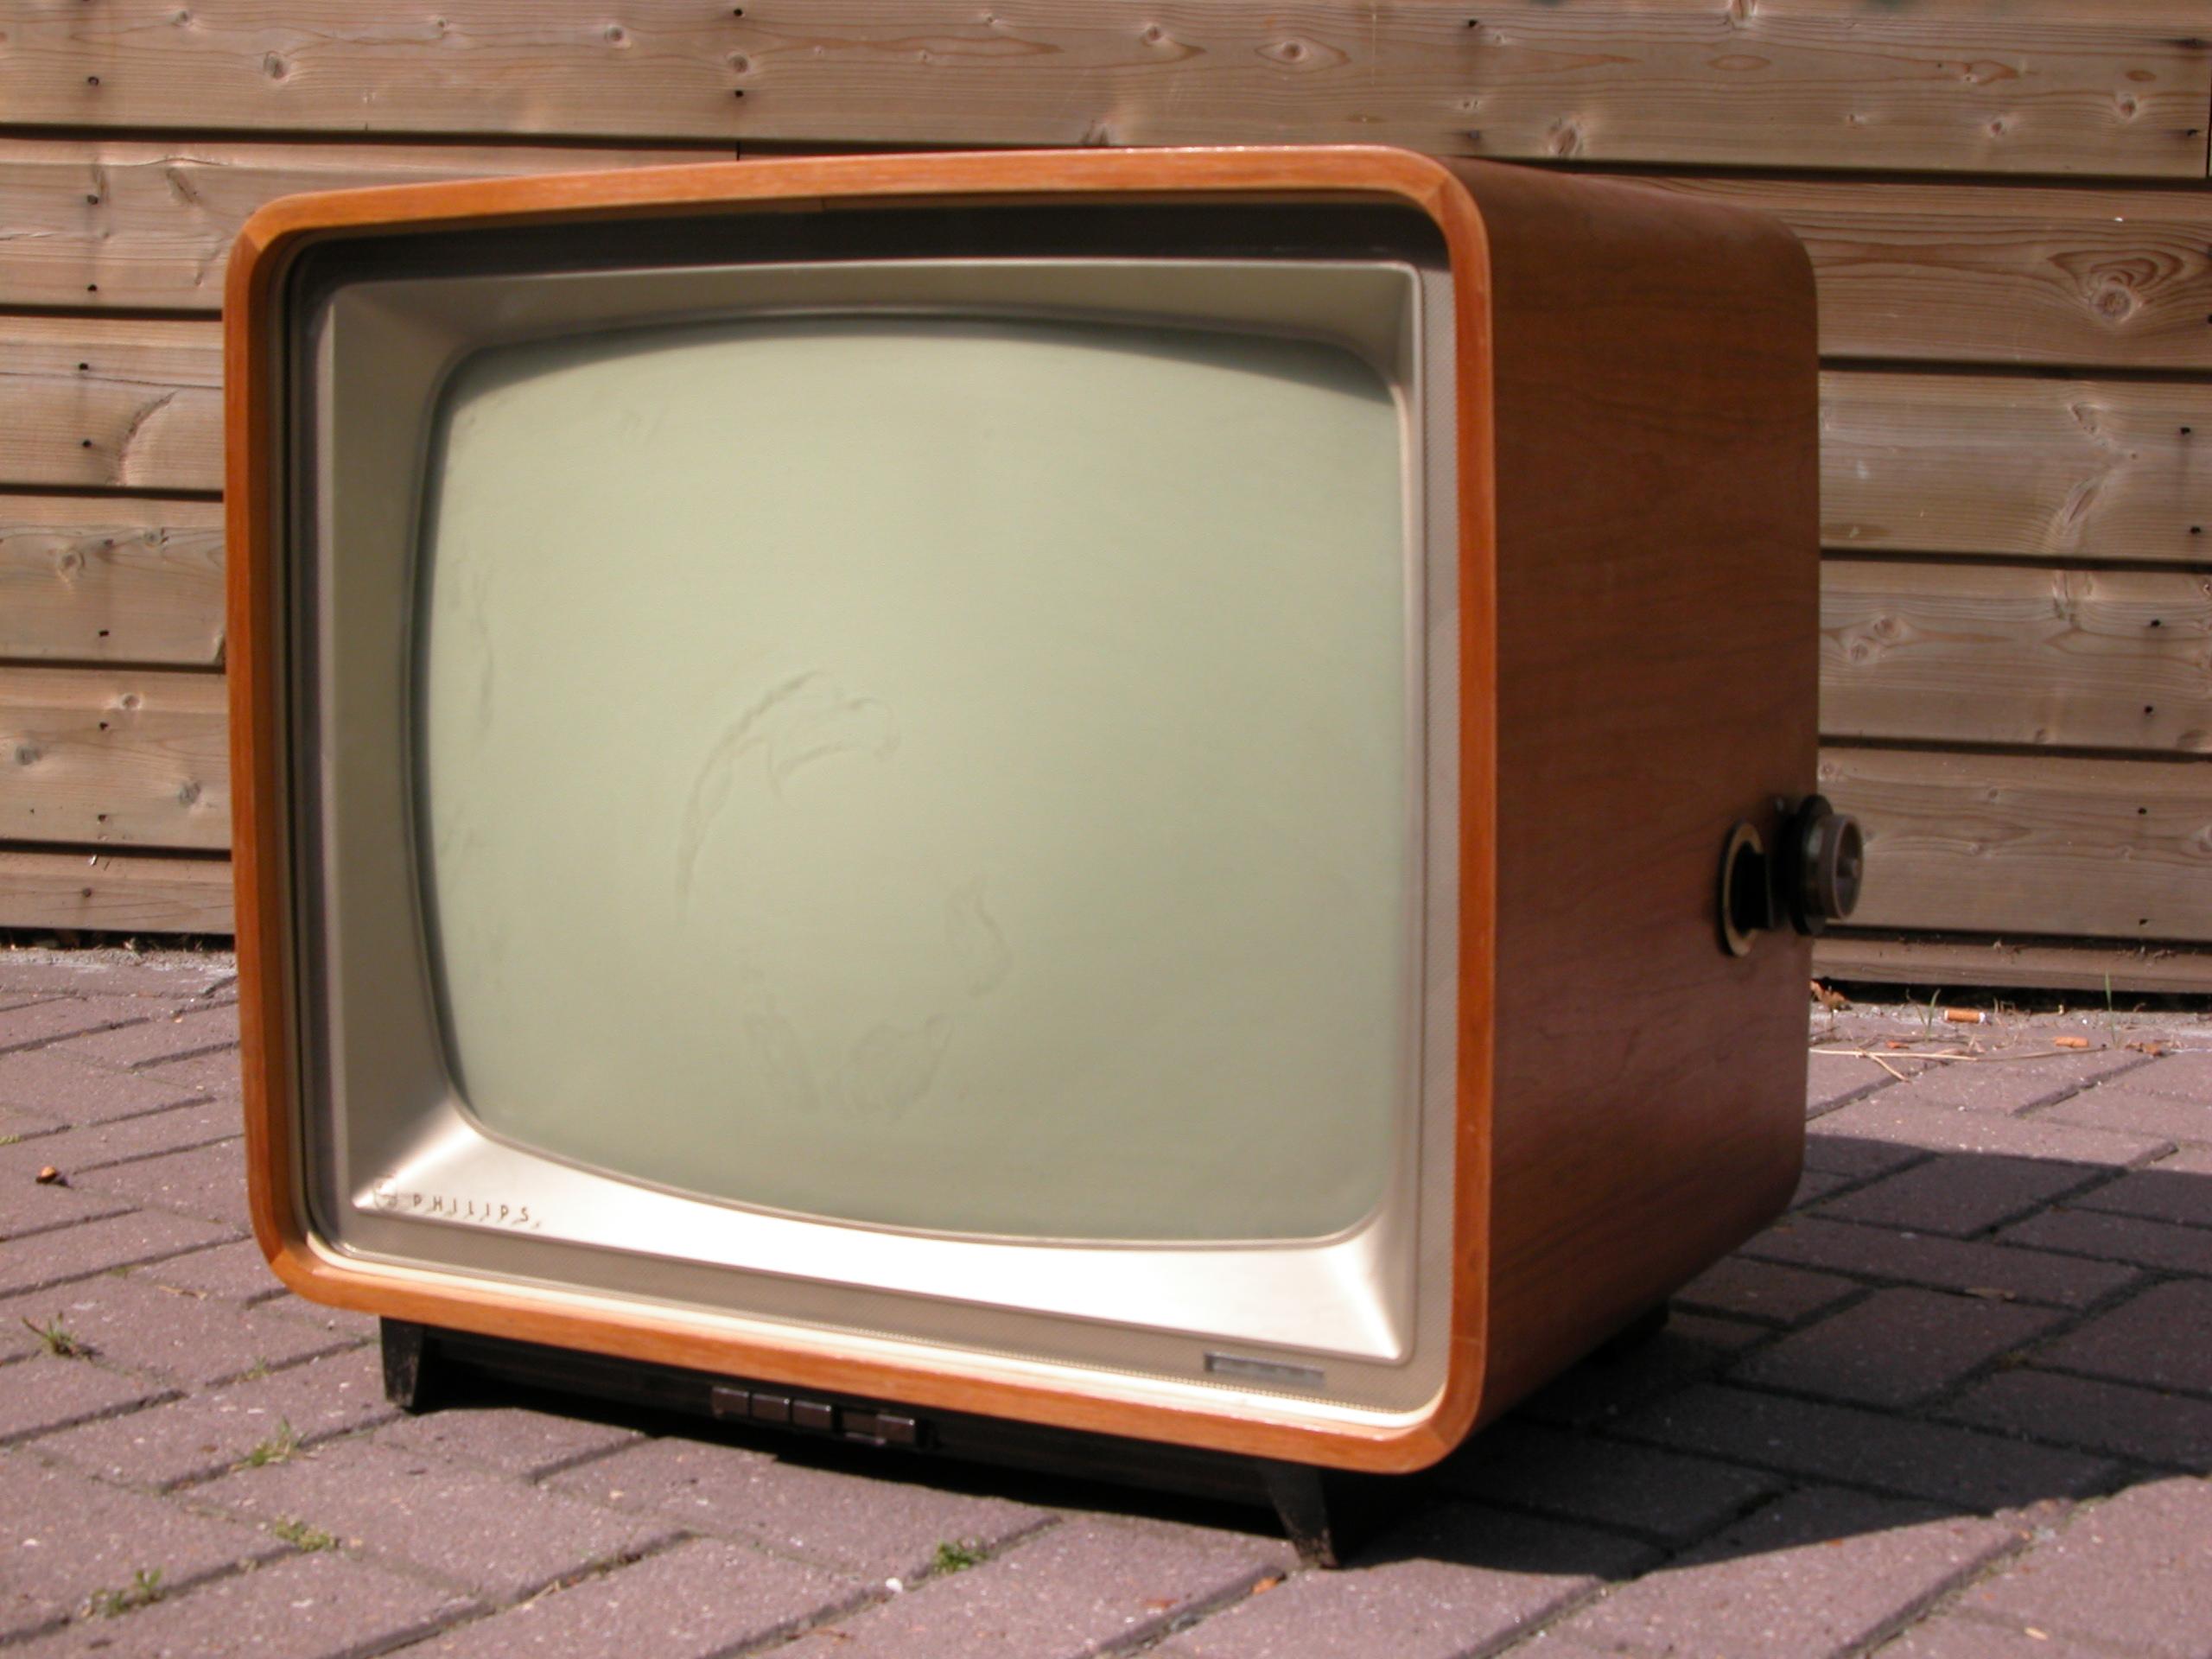 авито алдан ремонт телевизоров время для